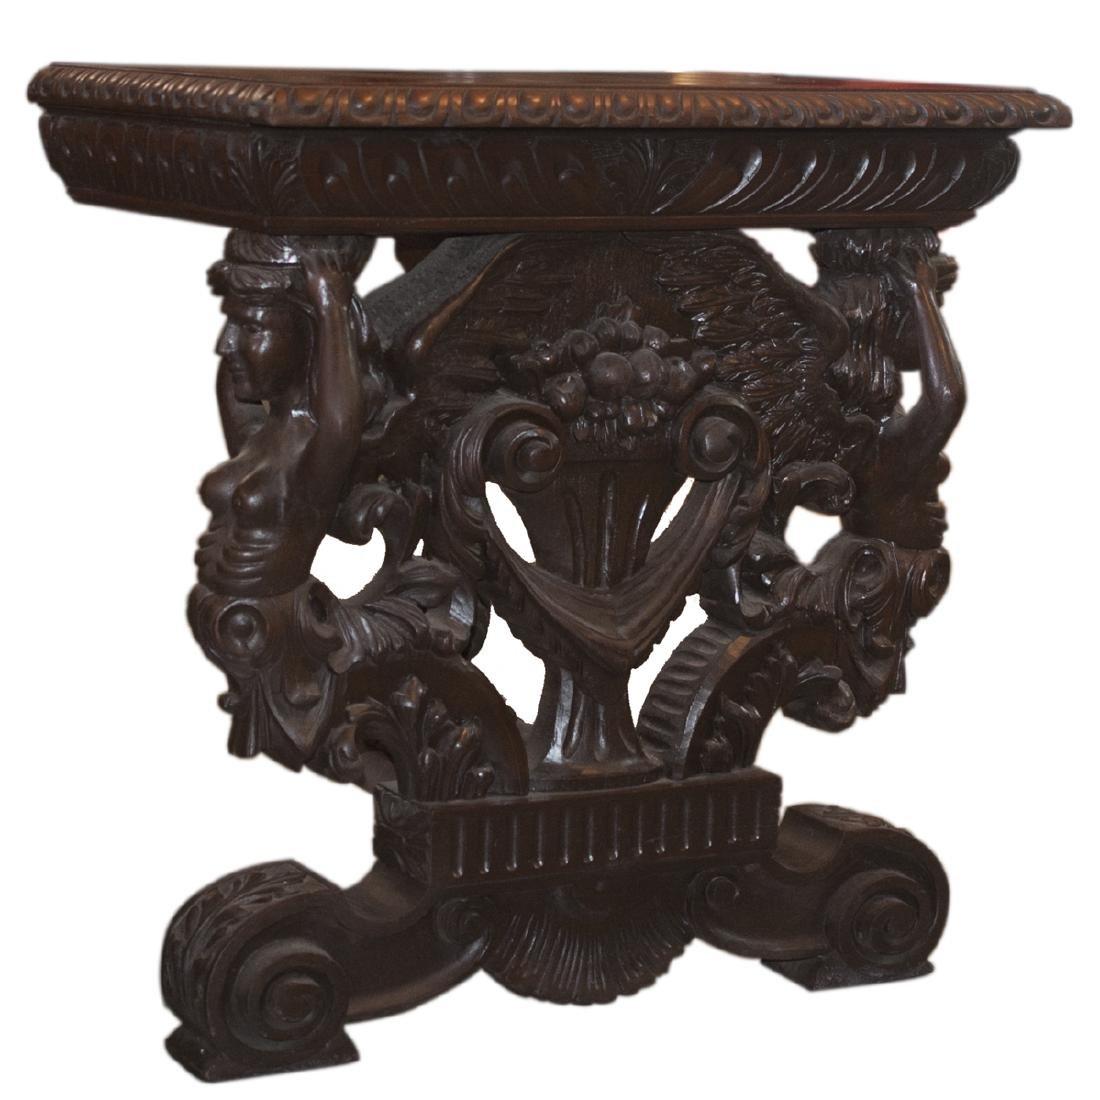 Wooden Figural Rococo Console Table